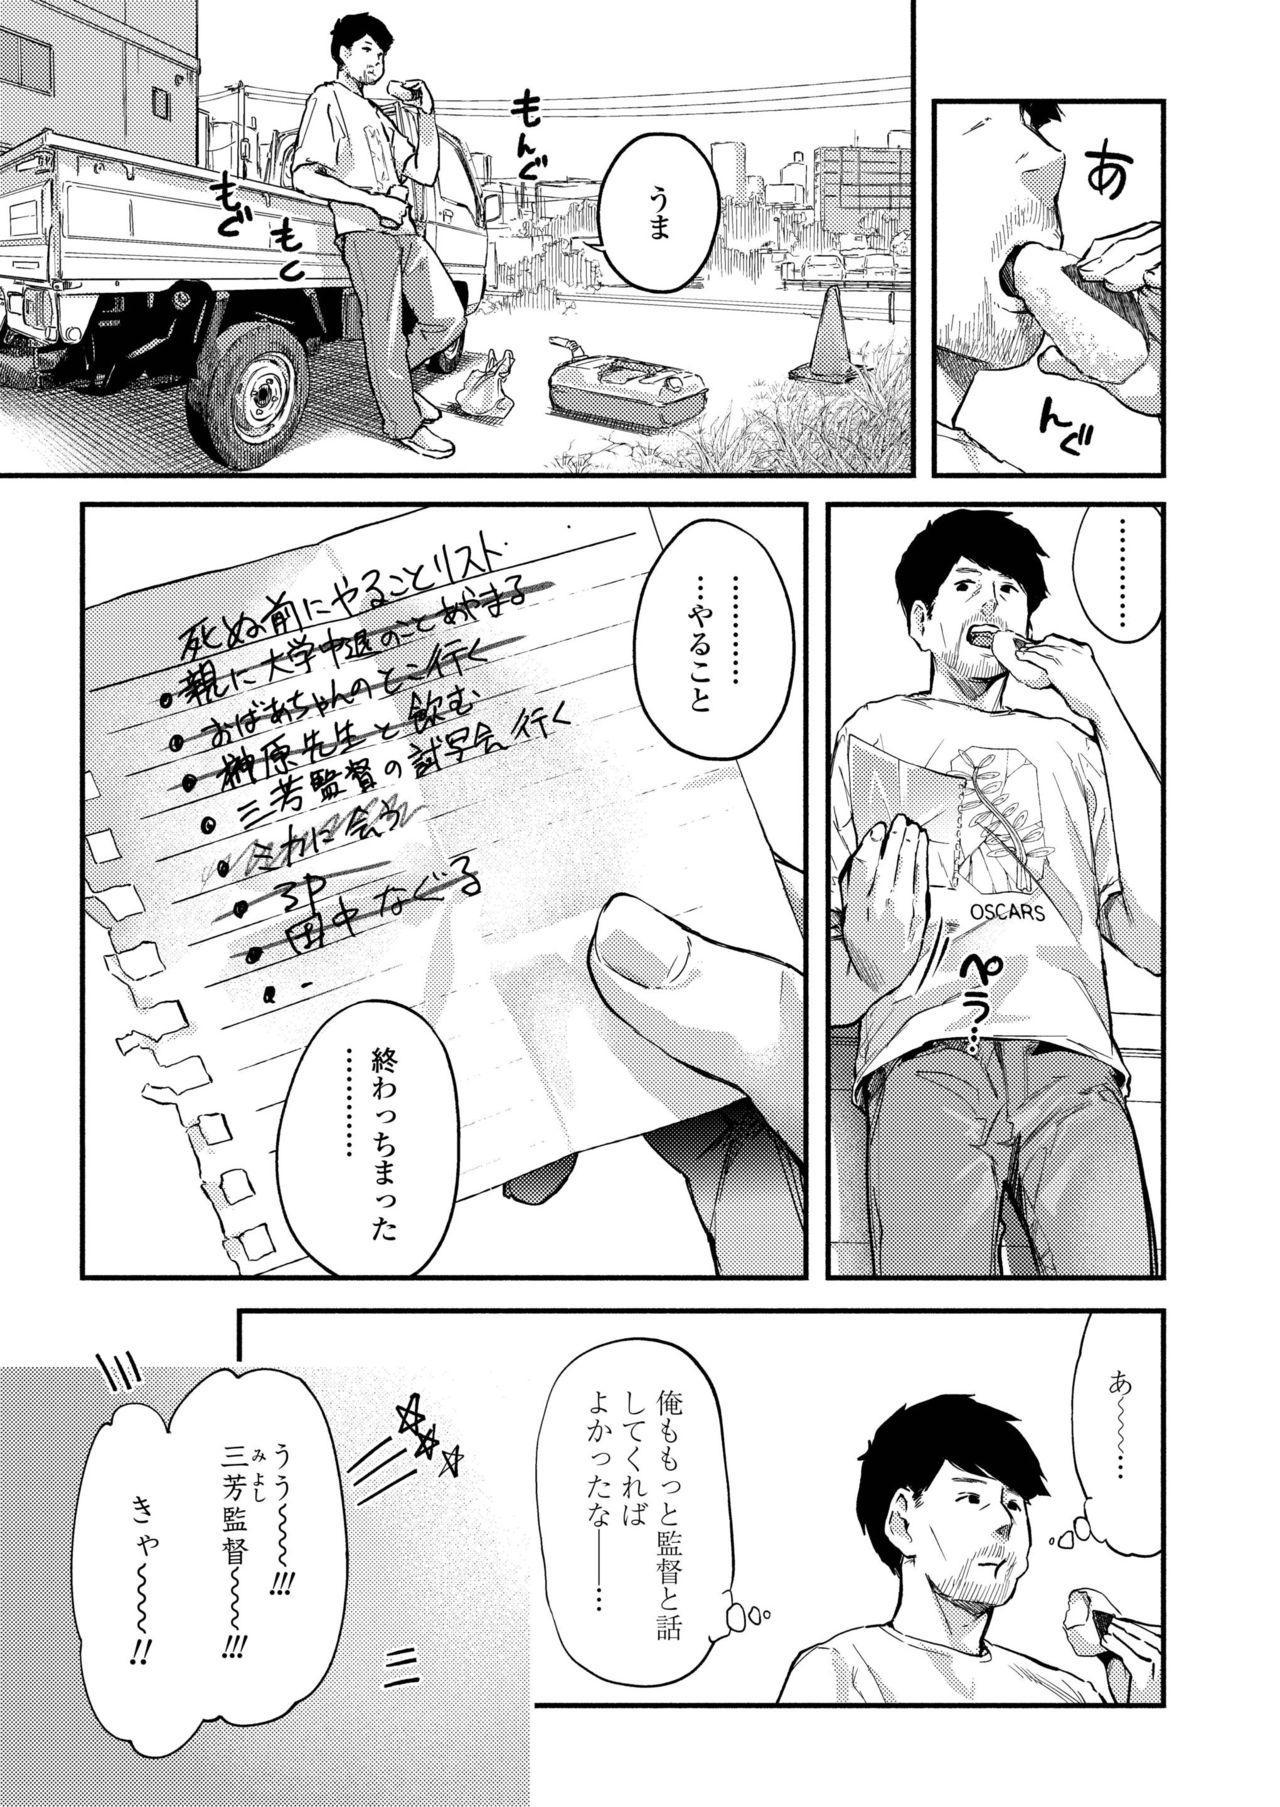 COMIC AOHA 2019 Haru 272